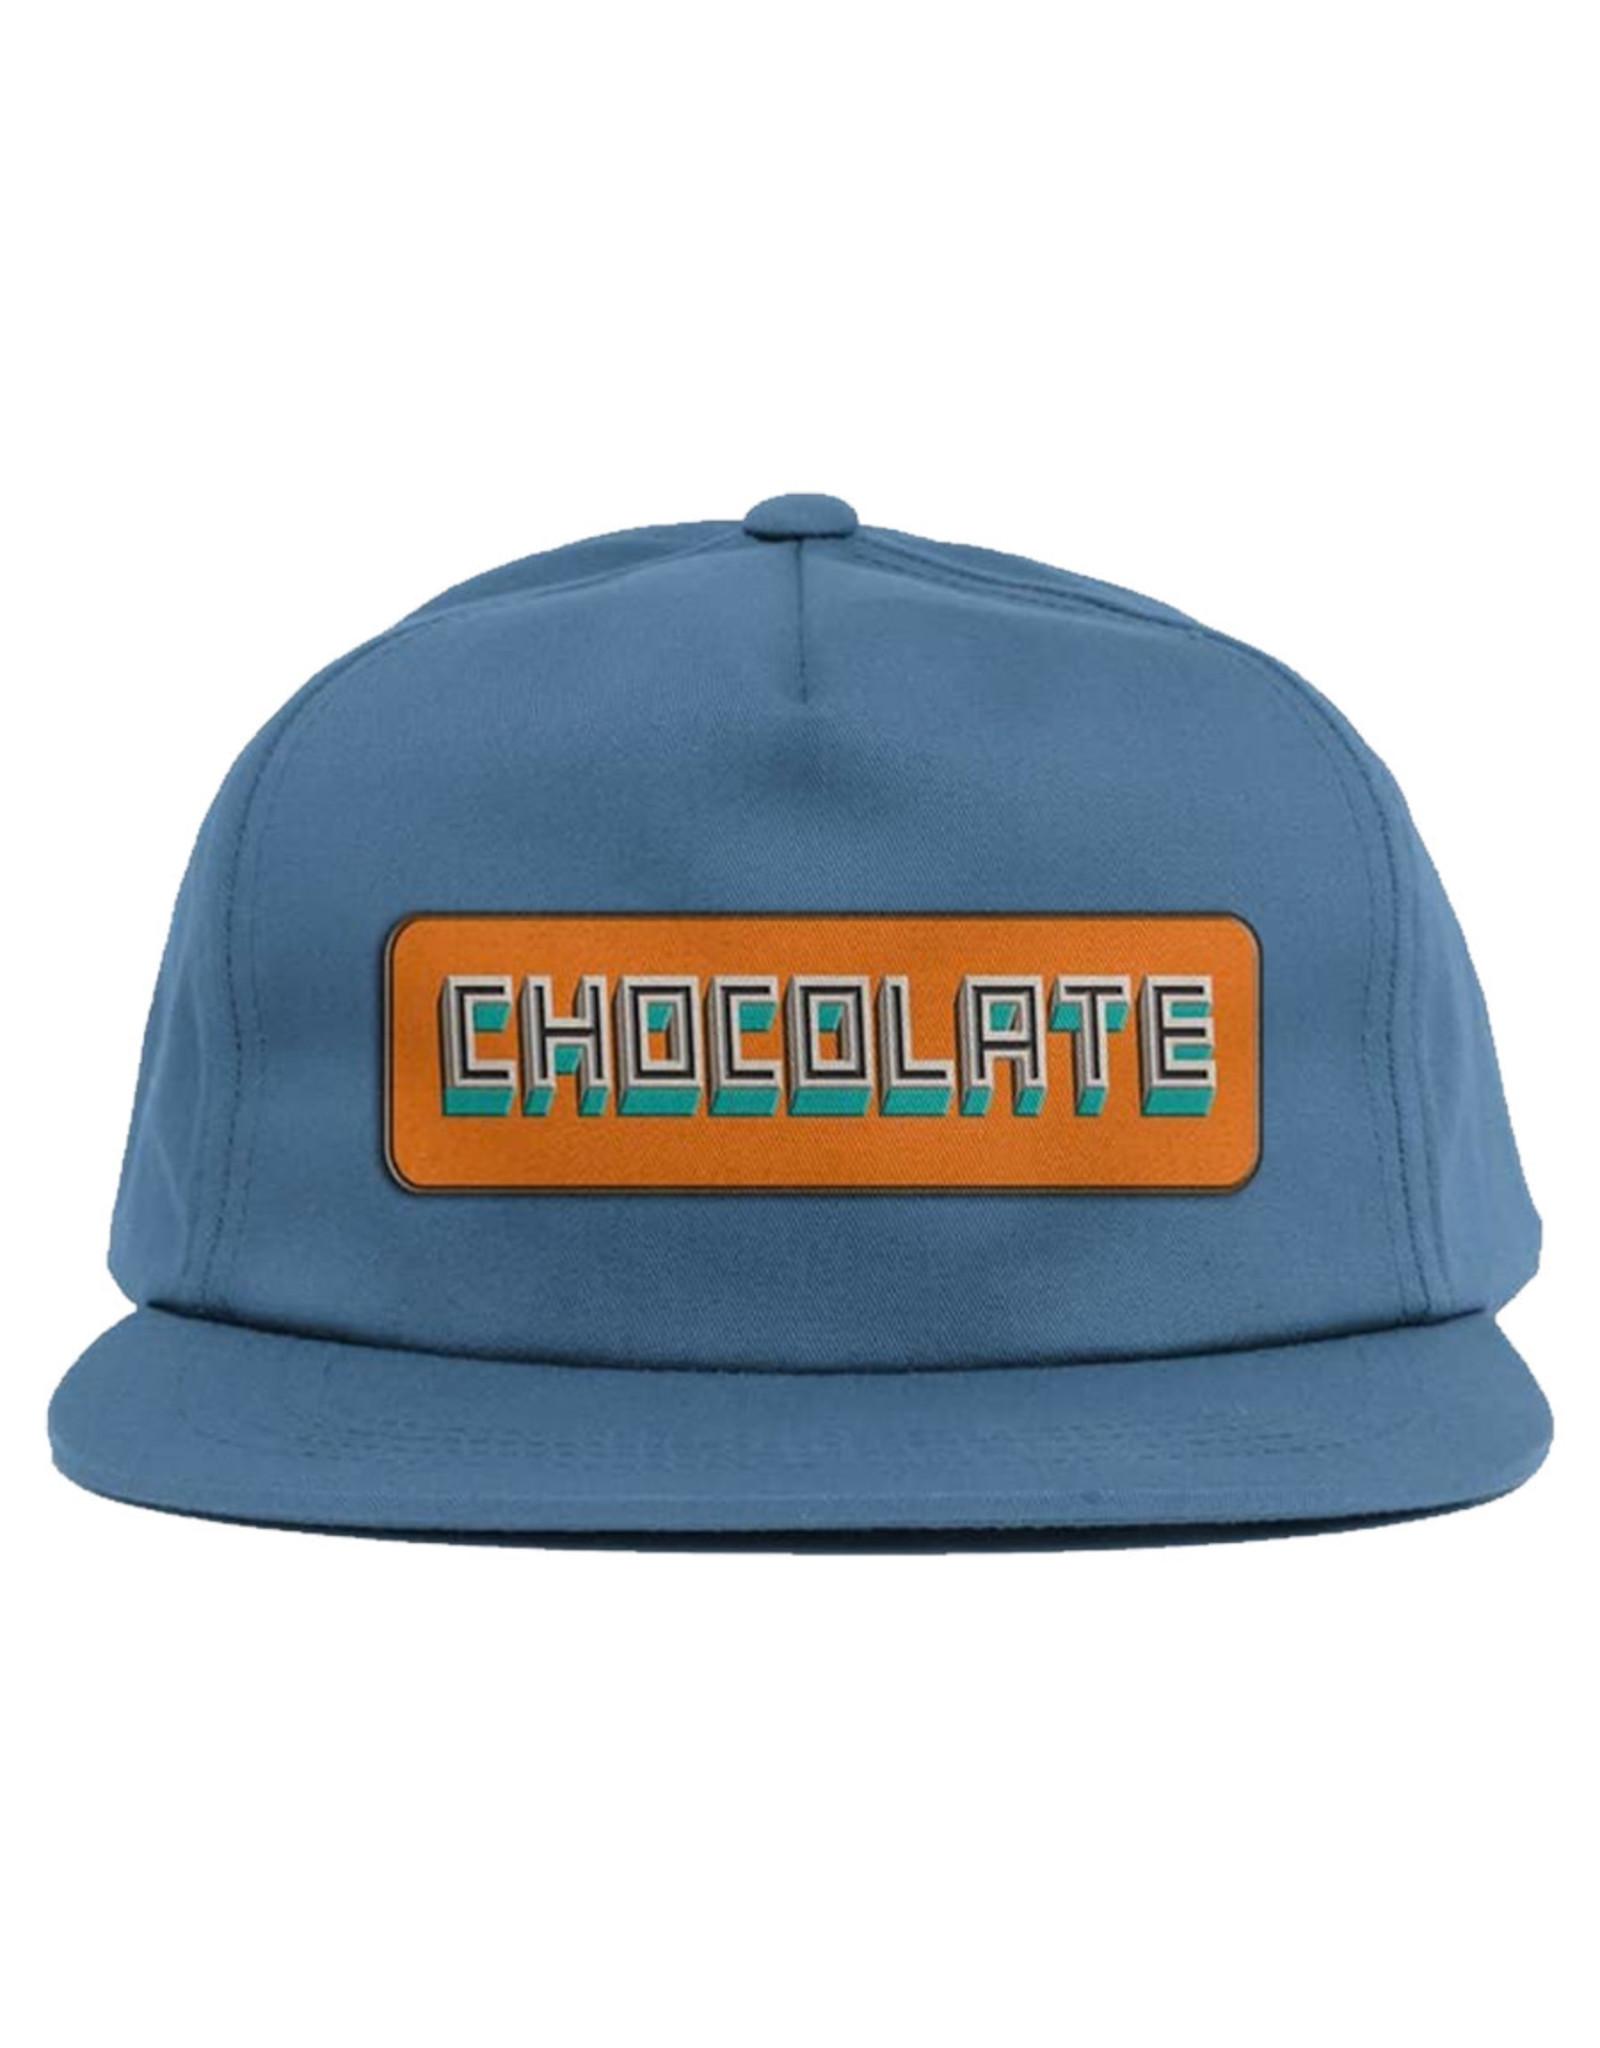 Chocolate Chocolate Hat Bar Snapback (Slate)